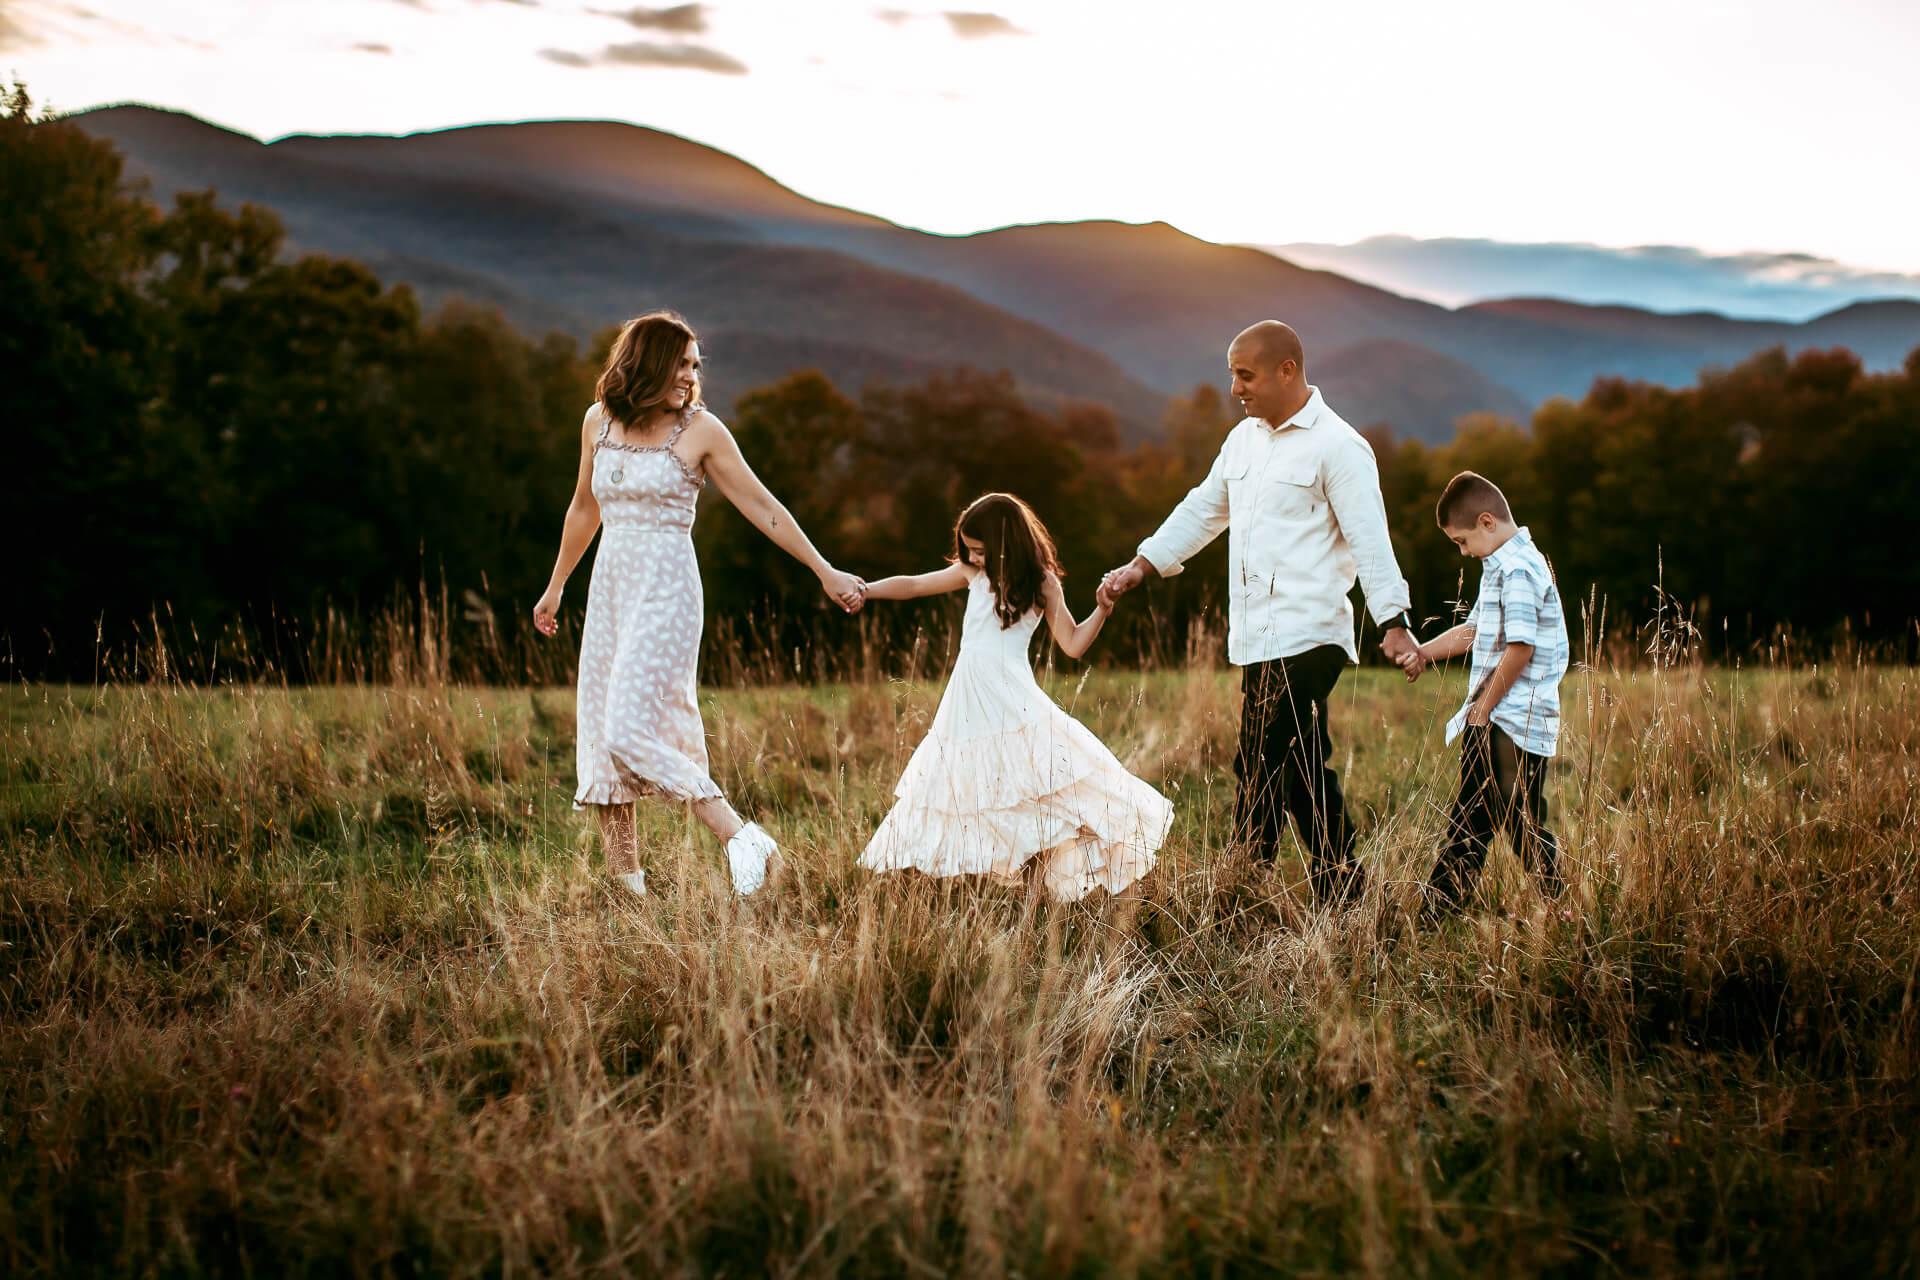 Family walking through field at sunset